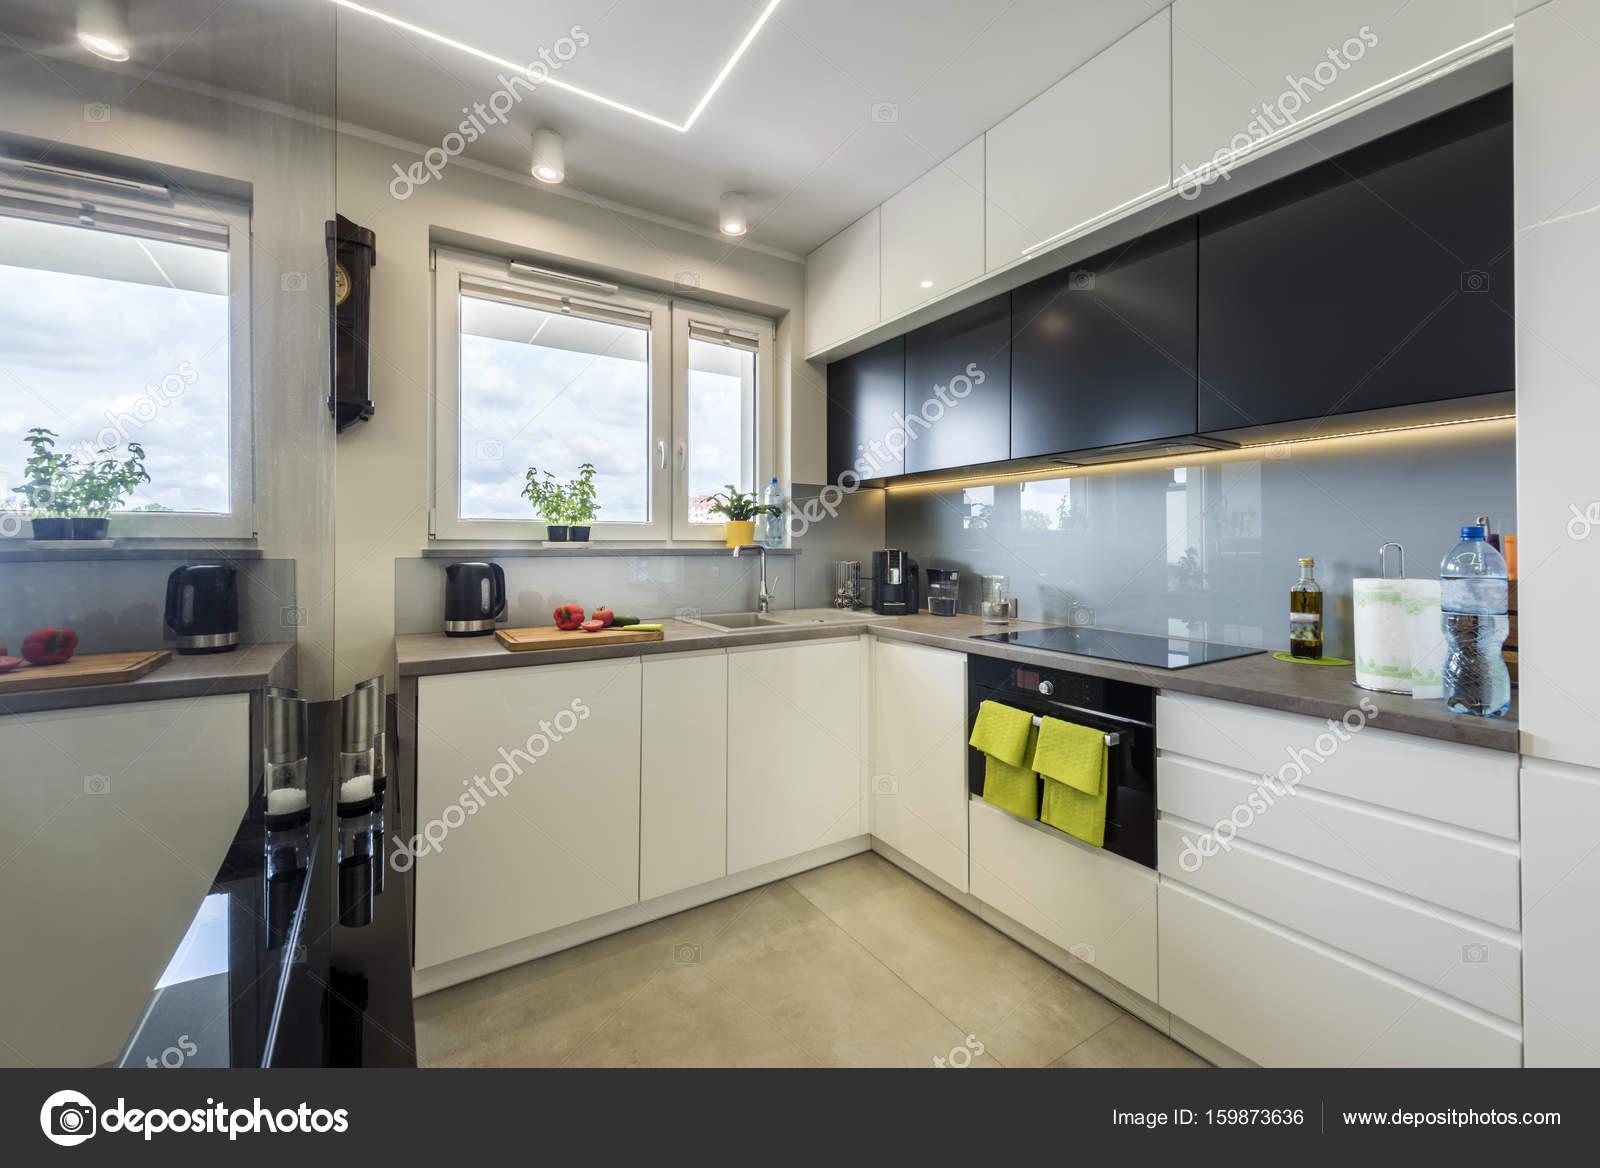 moderne Küche Innenarchitektur — Stockfoto © jacek_kadaj #159873636